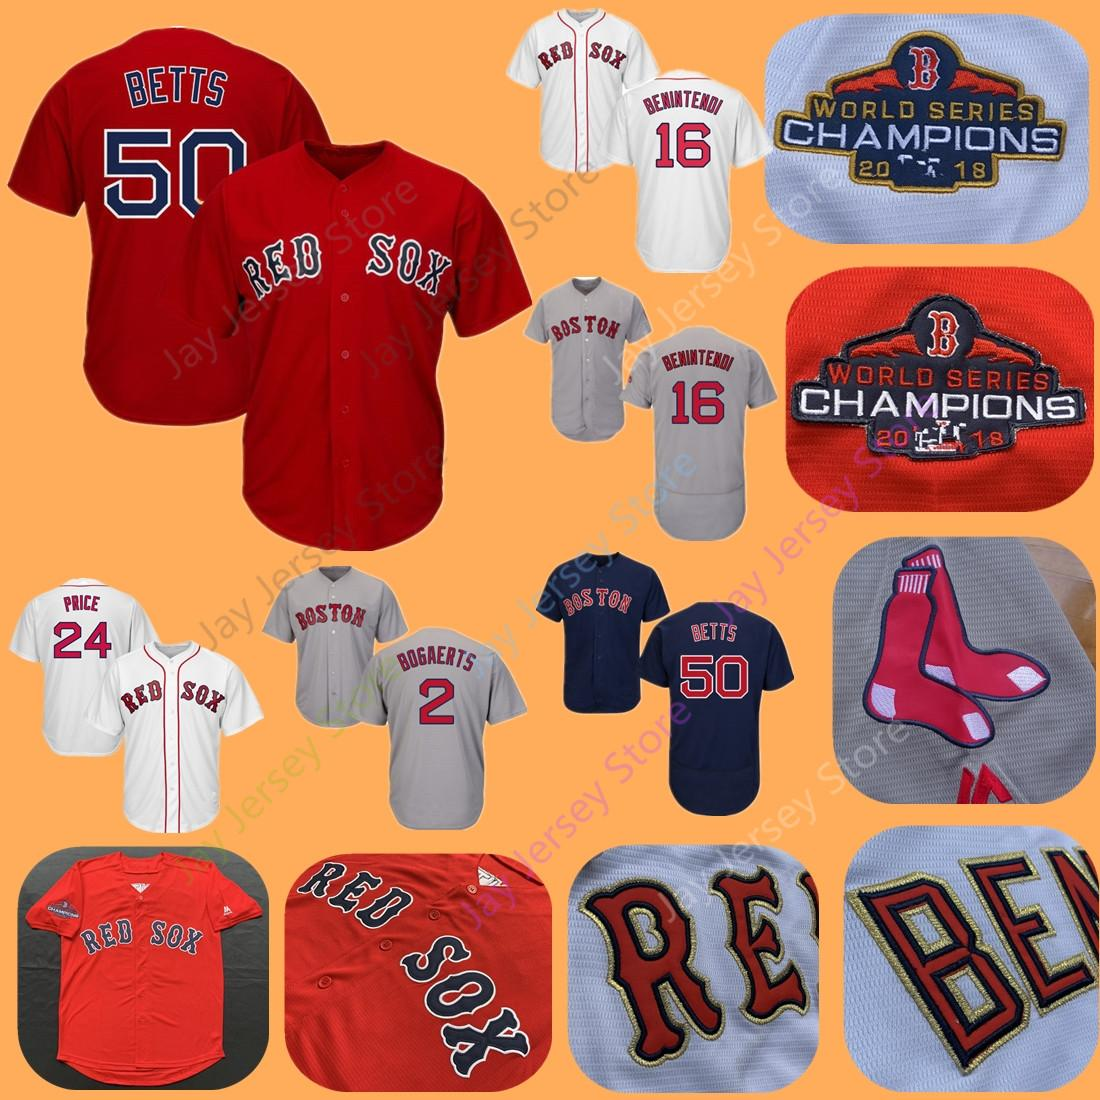 wholesale dealer 7e533 660d1 Boston Betts Benintendi Jersey Red Sox 2018 WS World Series Gold Champions  Bogaerts Pedroia Bradley Sale Martinez Ortiz Price Martinez Women